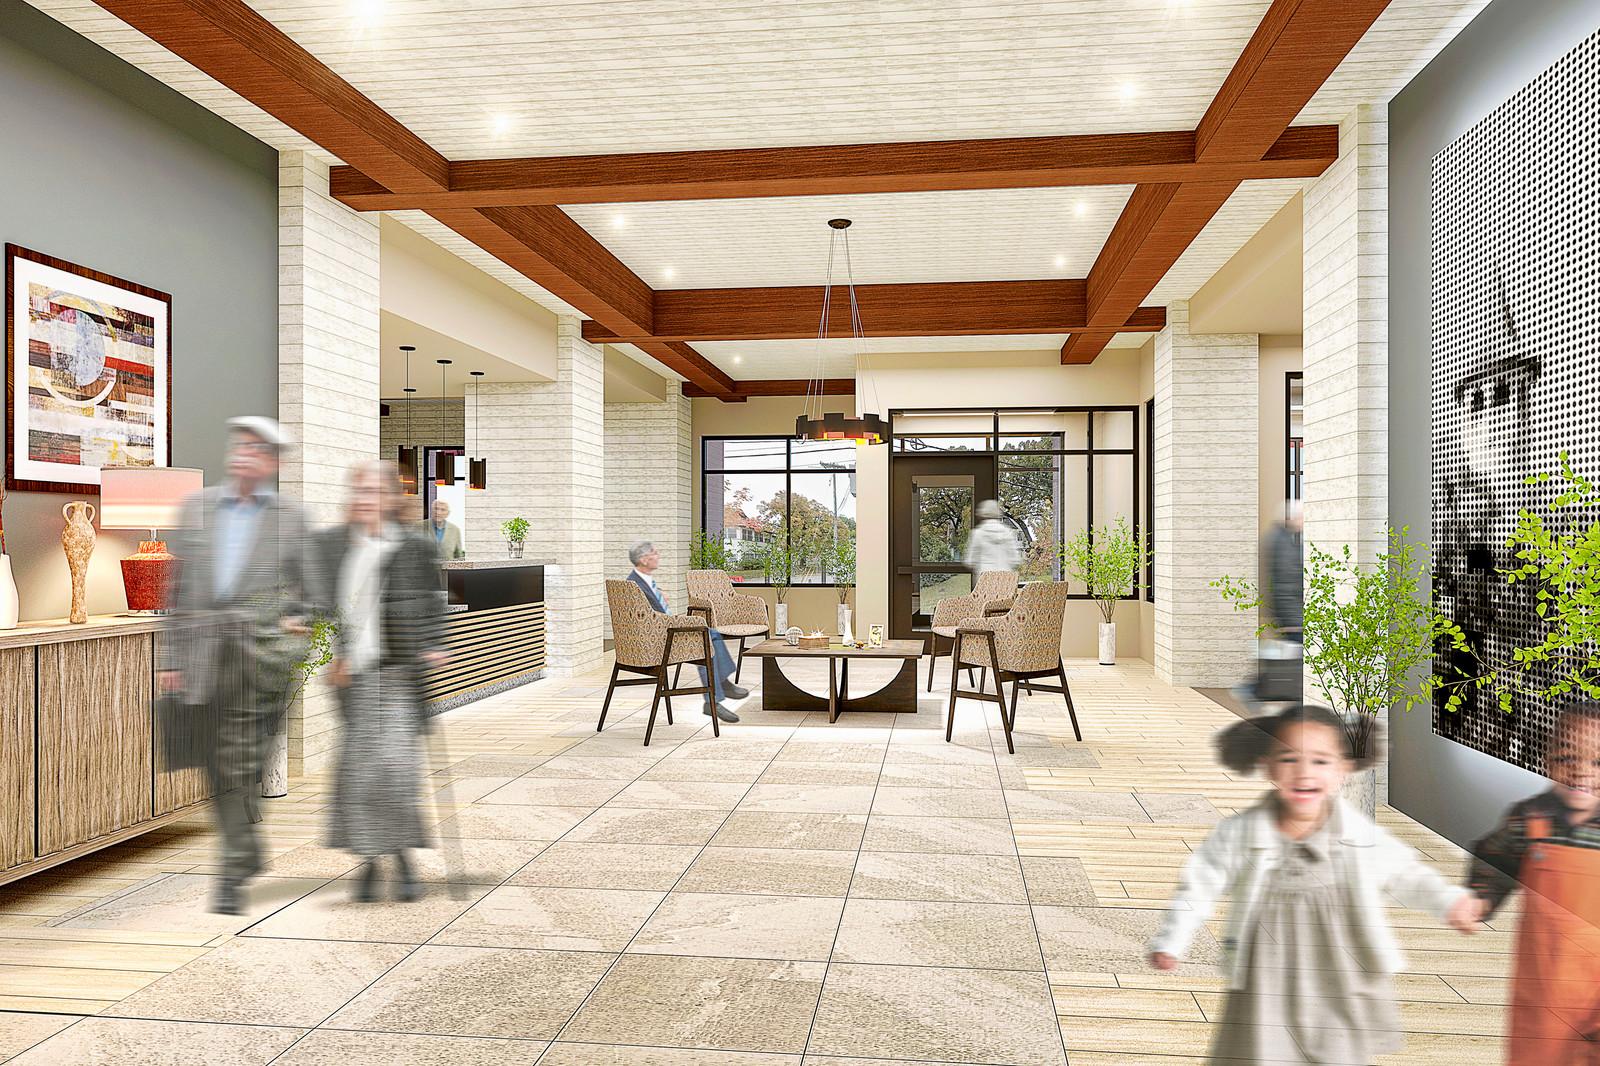 Senior Living Tushie Montgomery Architects Minnapolis